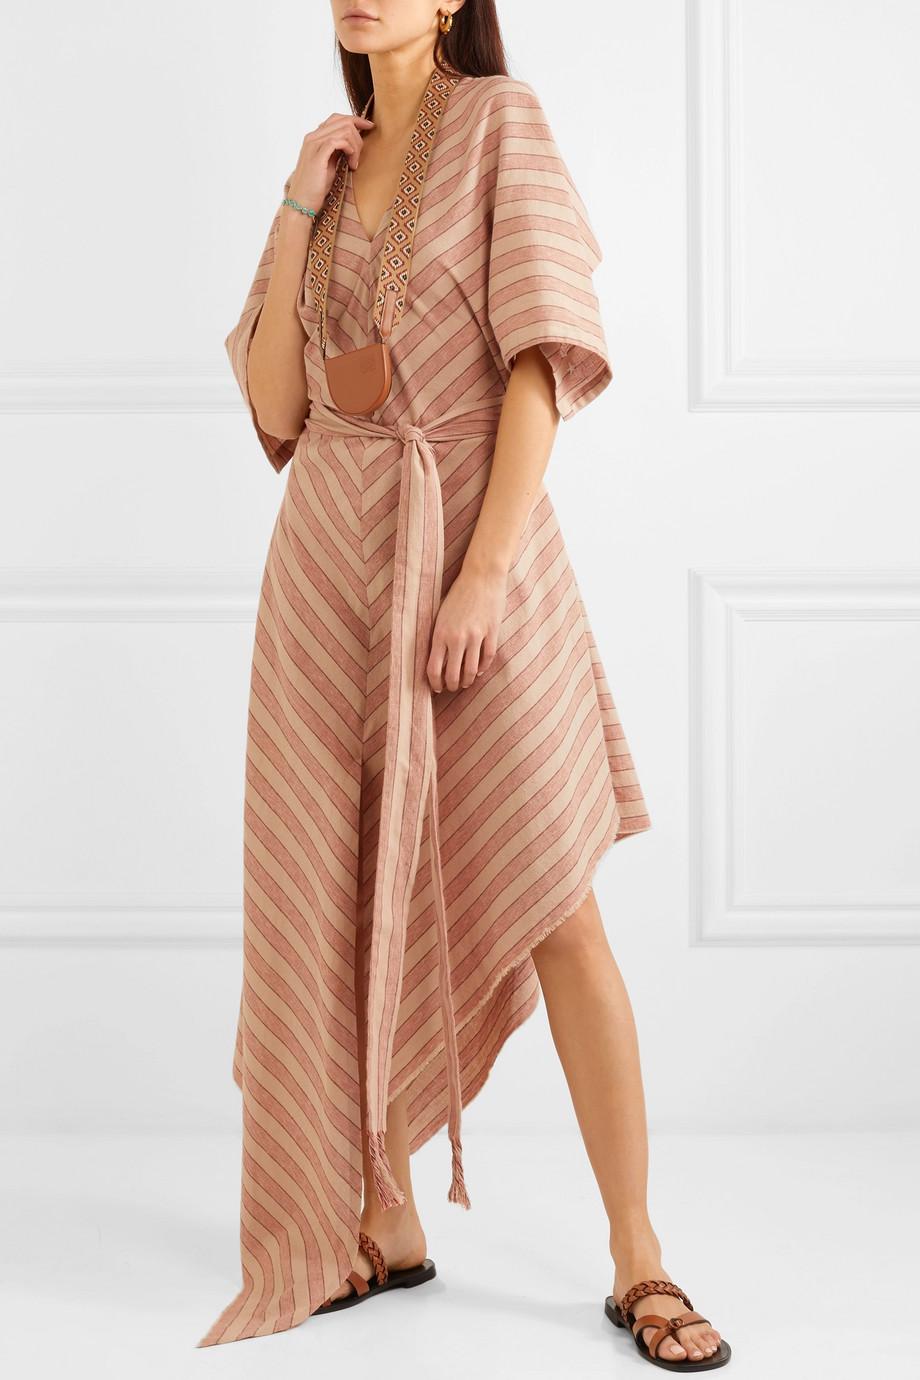 Beige Paula S Ibiza Belted Striped Cotton Gauze Midi Dress Loewe Midi Dress Dresses Striped [ 1380 x 920 Pixel ]